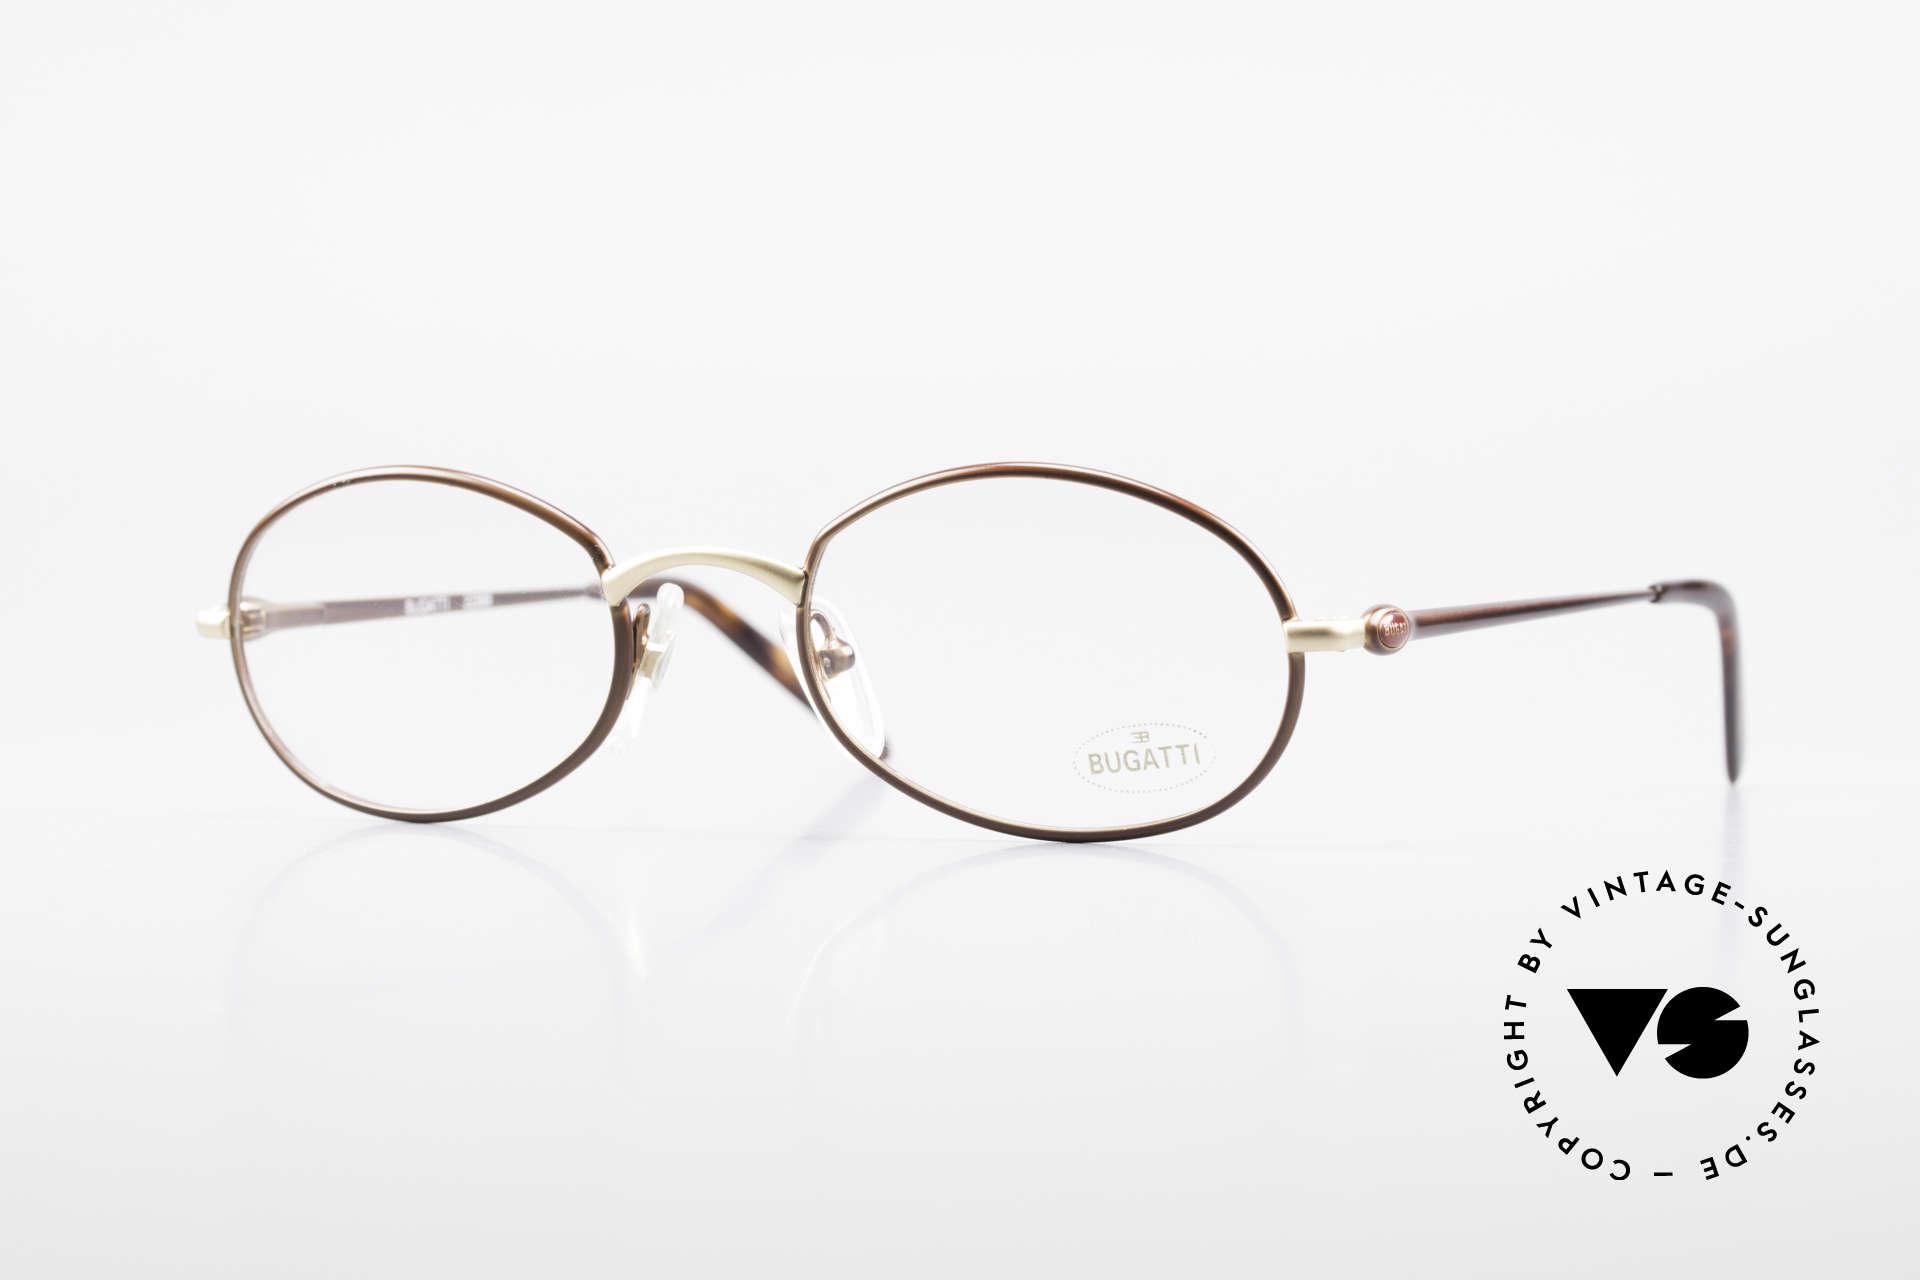 Bugatti 22369 Rare Oval 90's Vintage Frame, elegant vintage designer eyeglass-frame by BUGATTI, Made for Men and Women